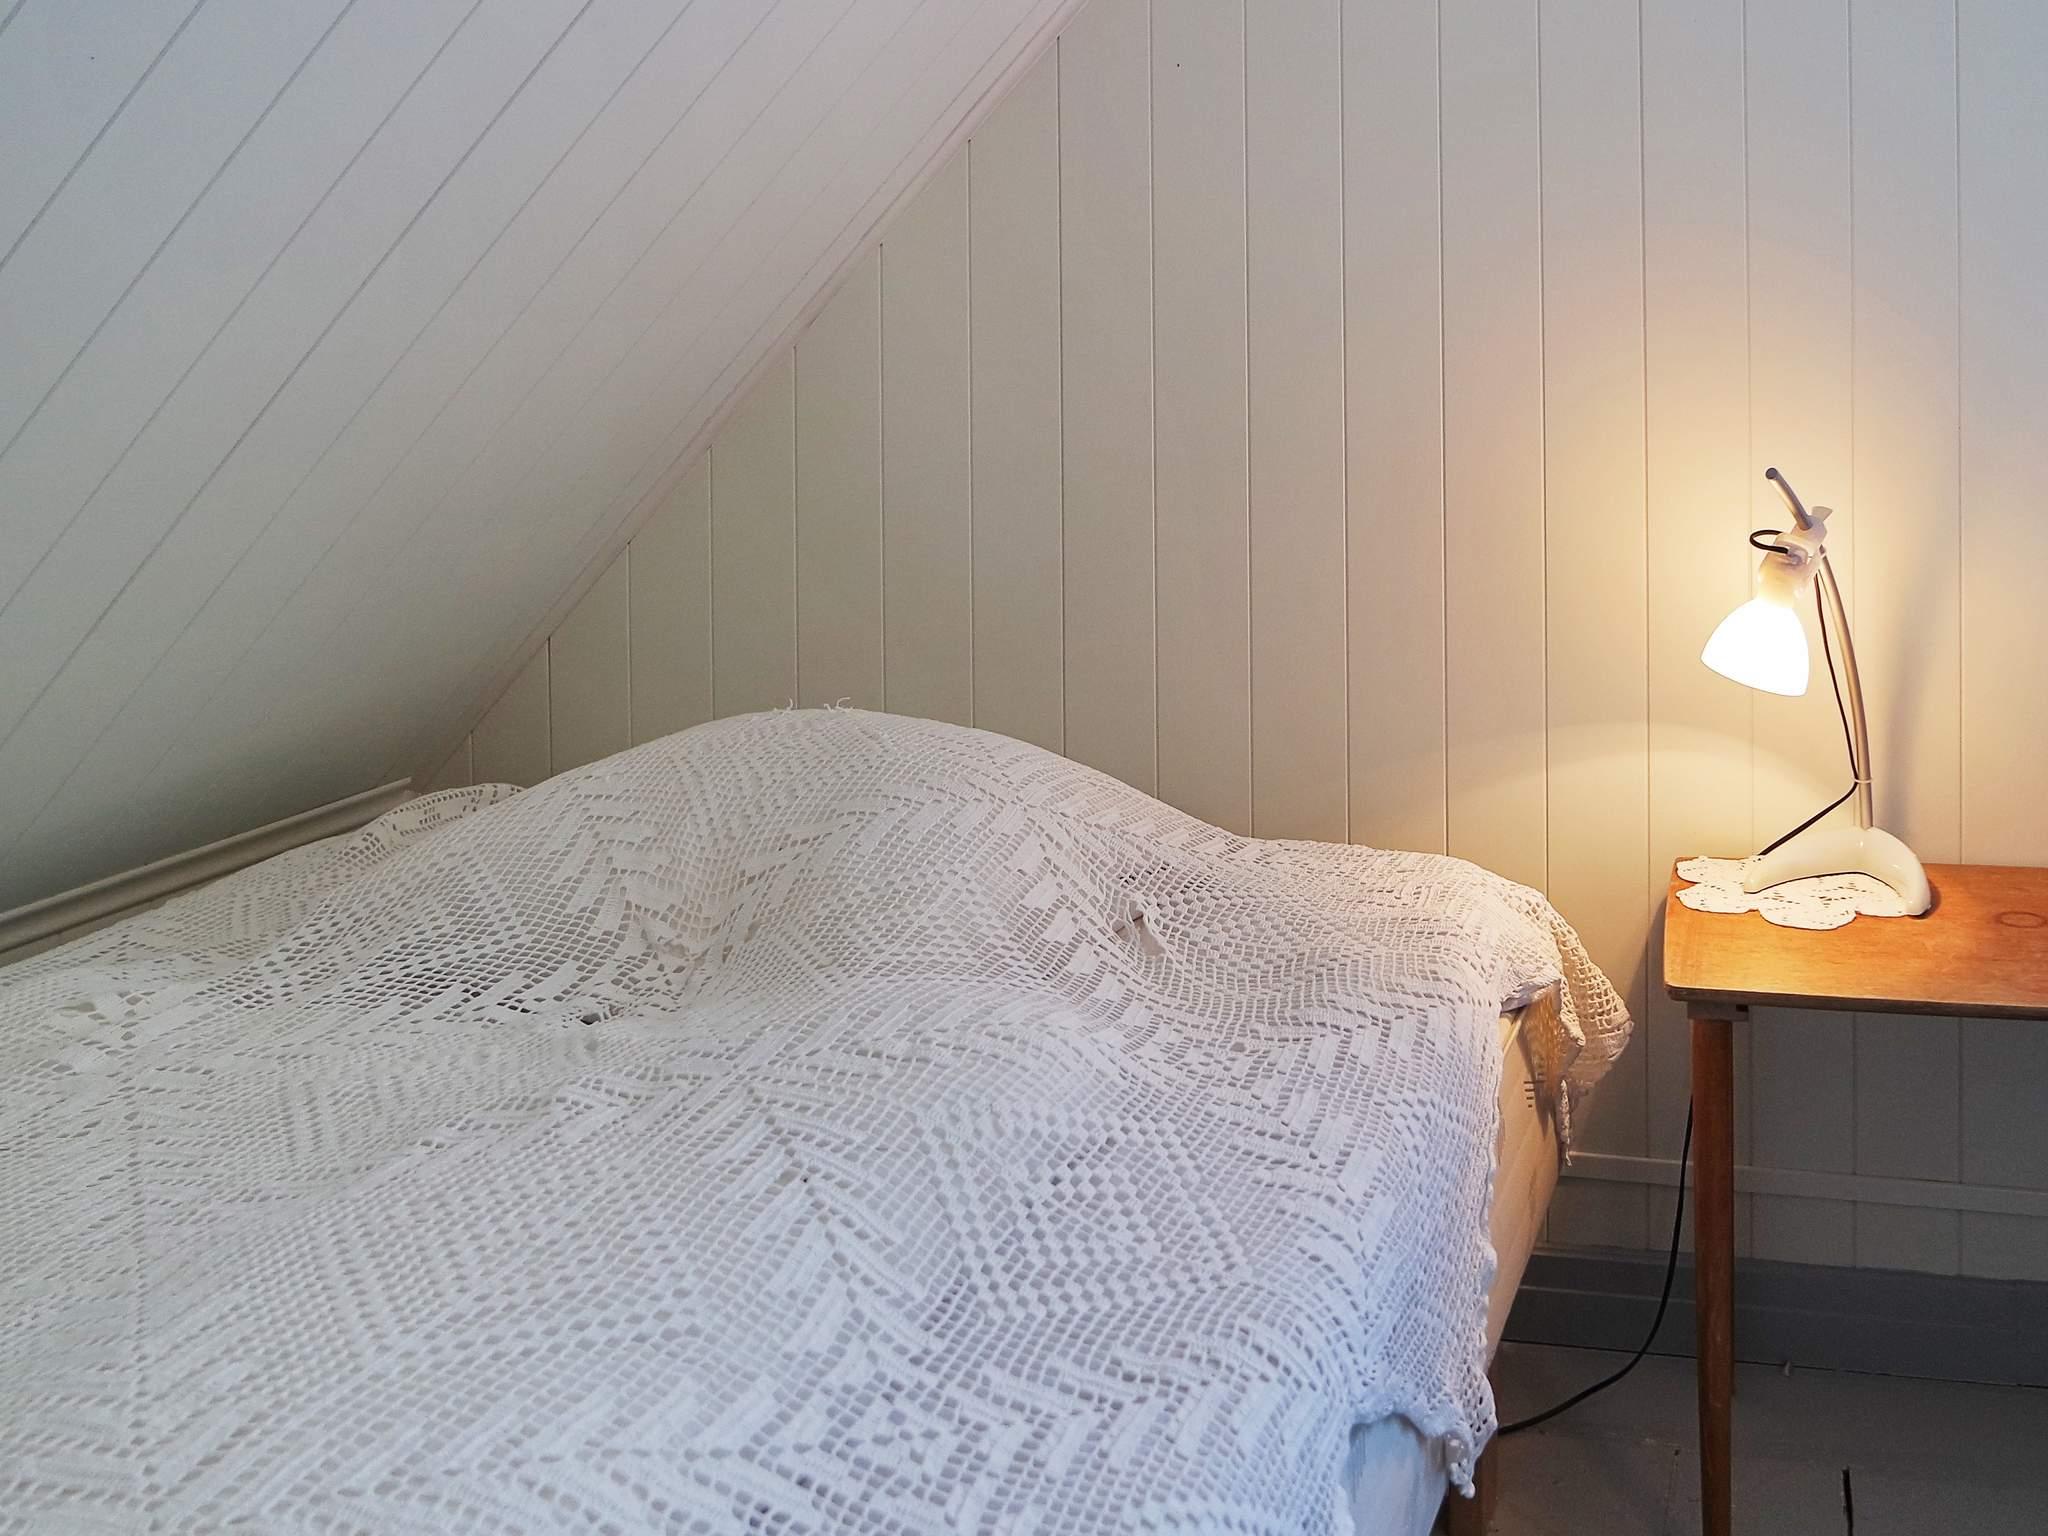 Ferienhaus Etne (2538129), Etne, Hordaland - Hardangerfjord, Westnorwegen, Norwegen, Bild 13